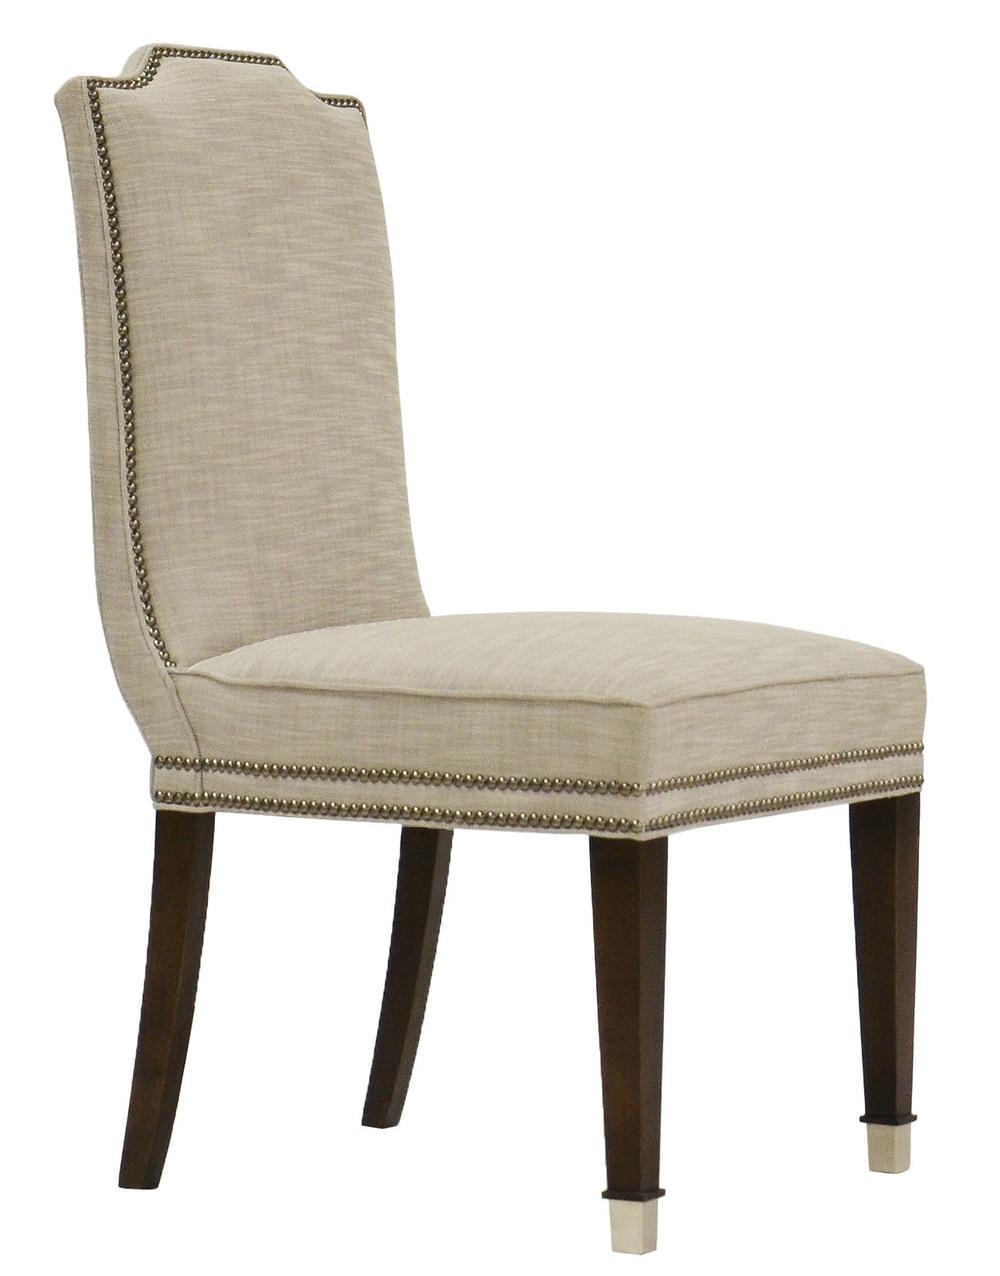 Vanguard Furniture - Travis Side Chair